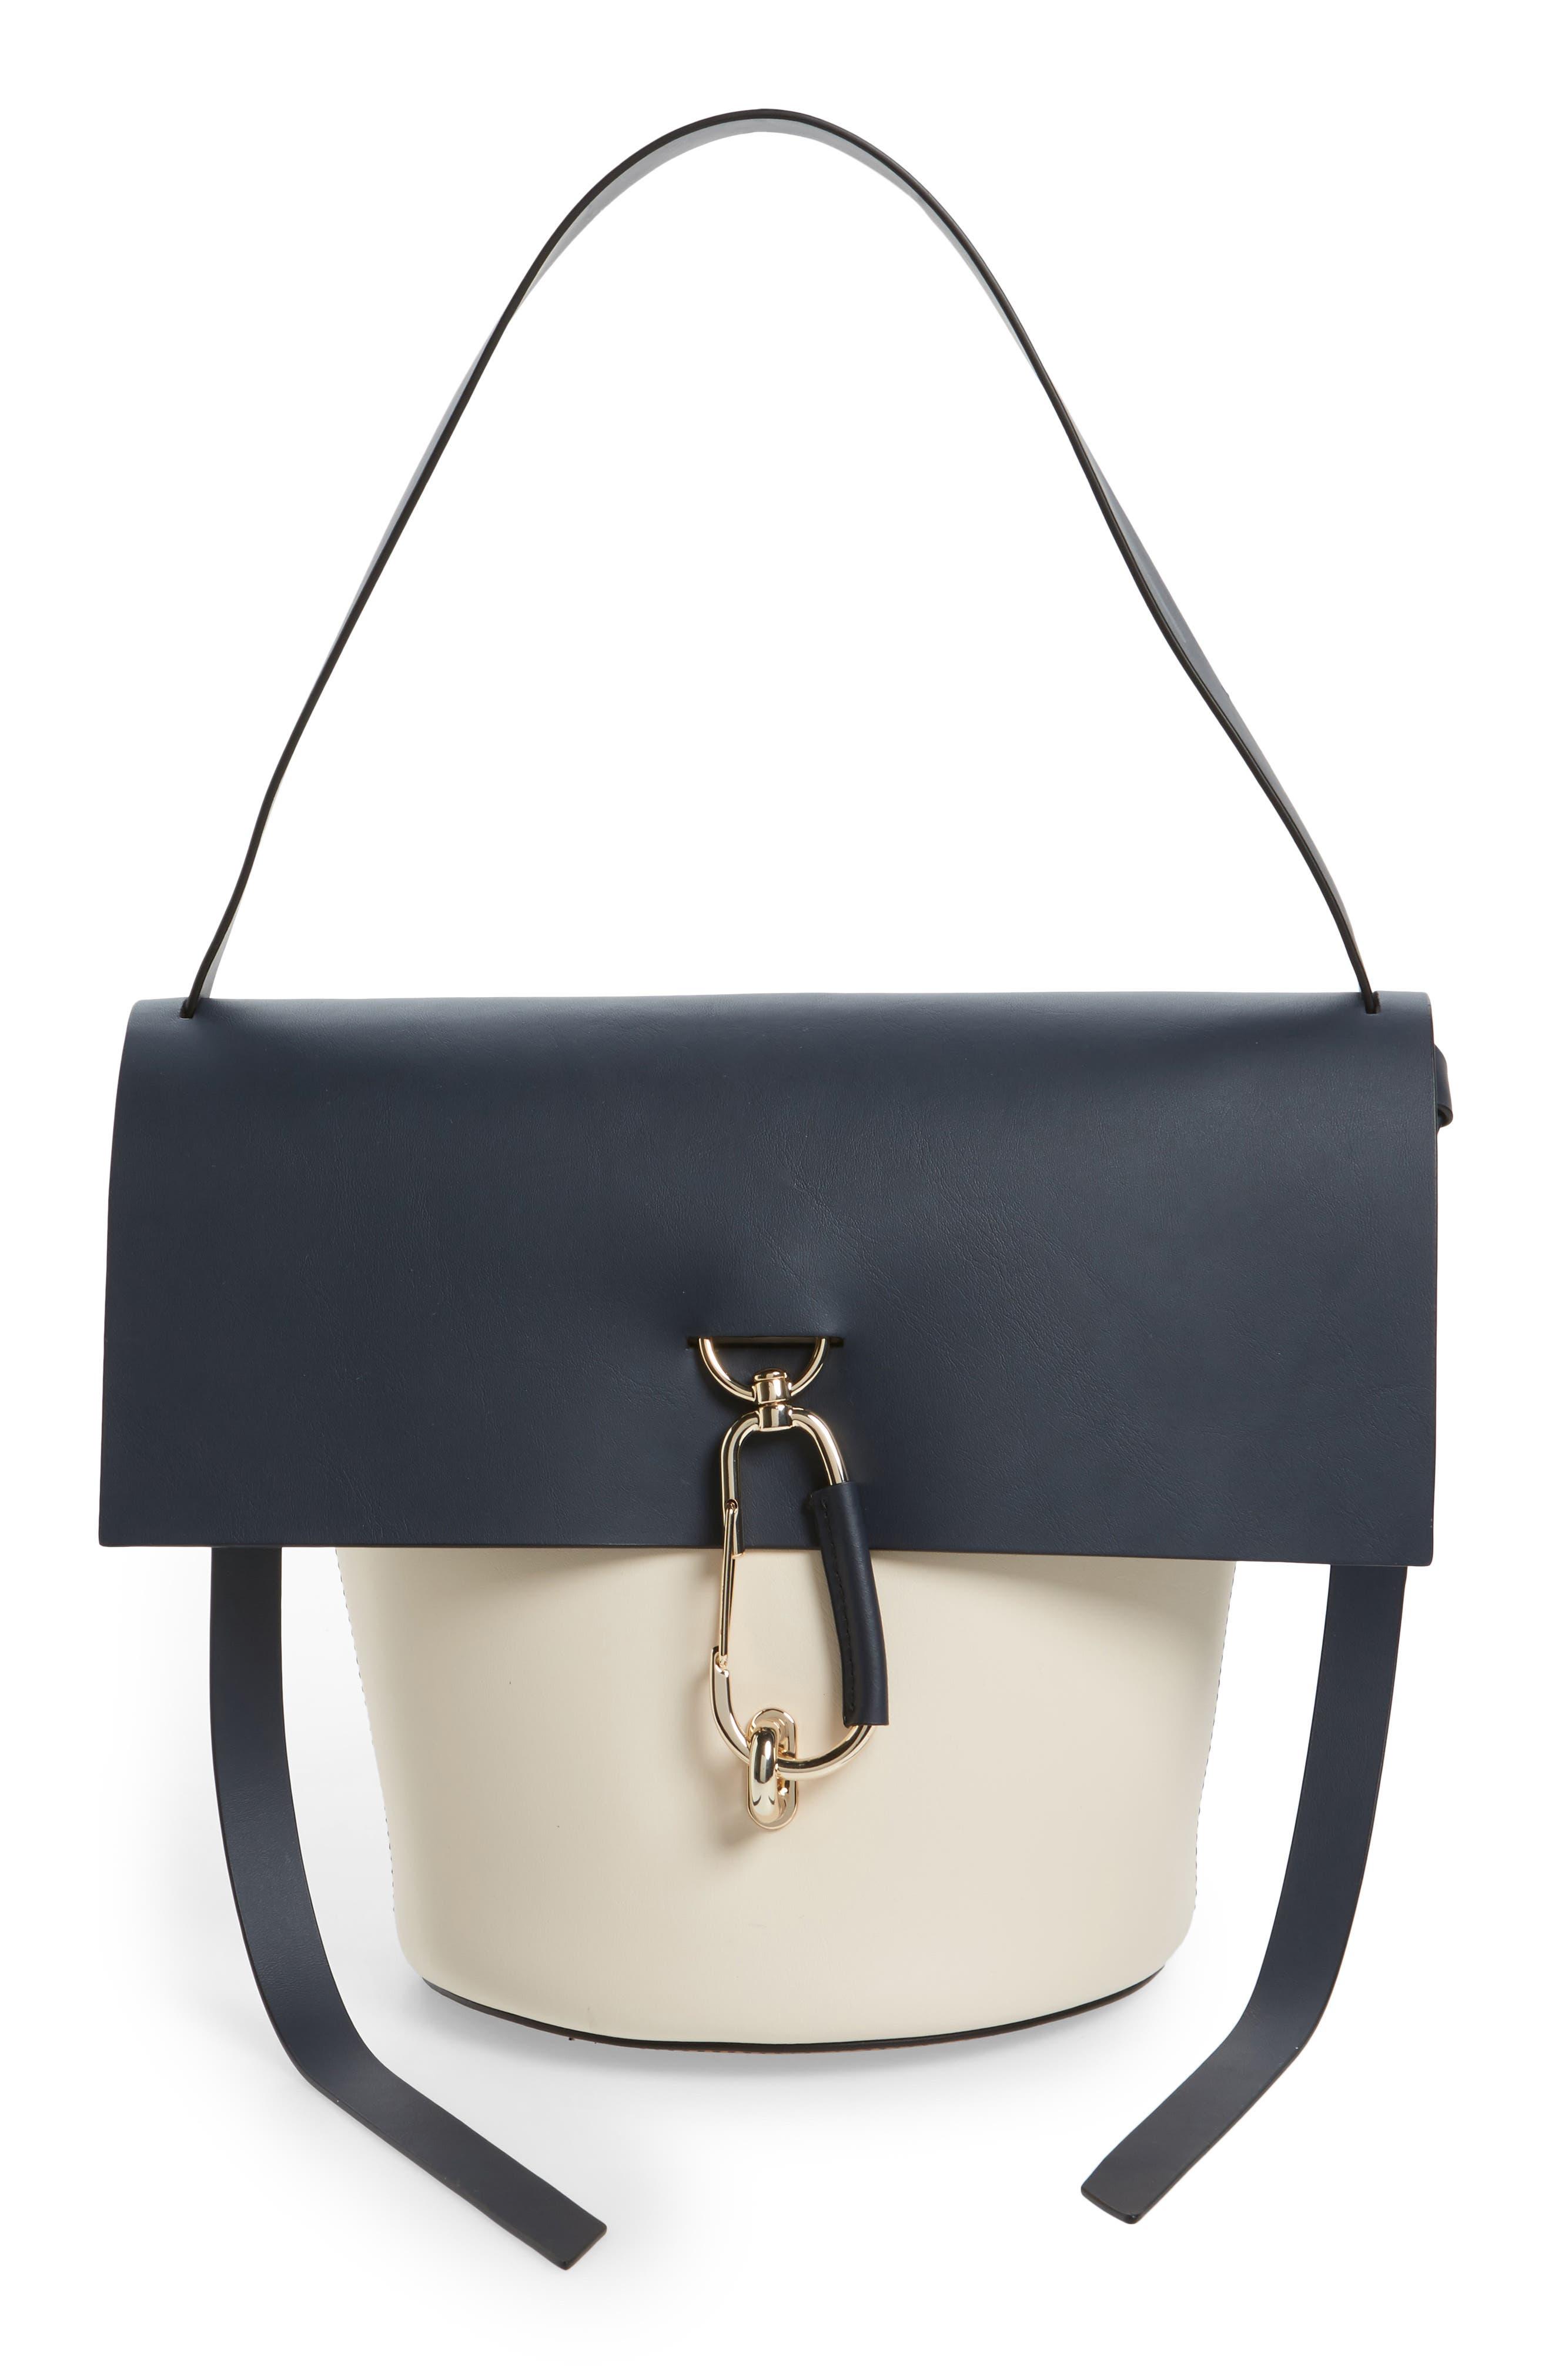 ZAC Zac Posen Belay Colorblock Leather Bucket Bag